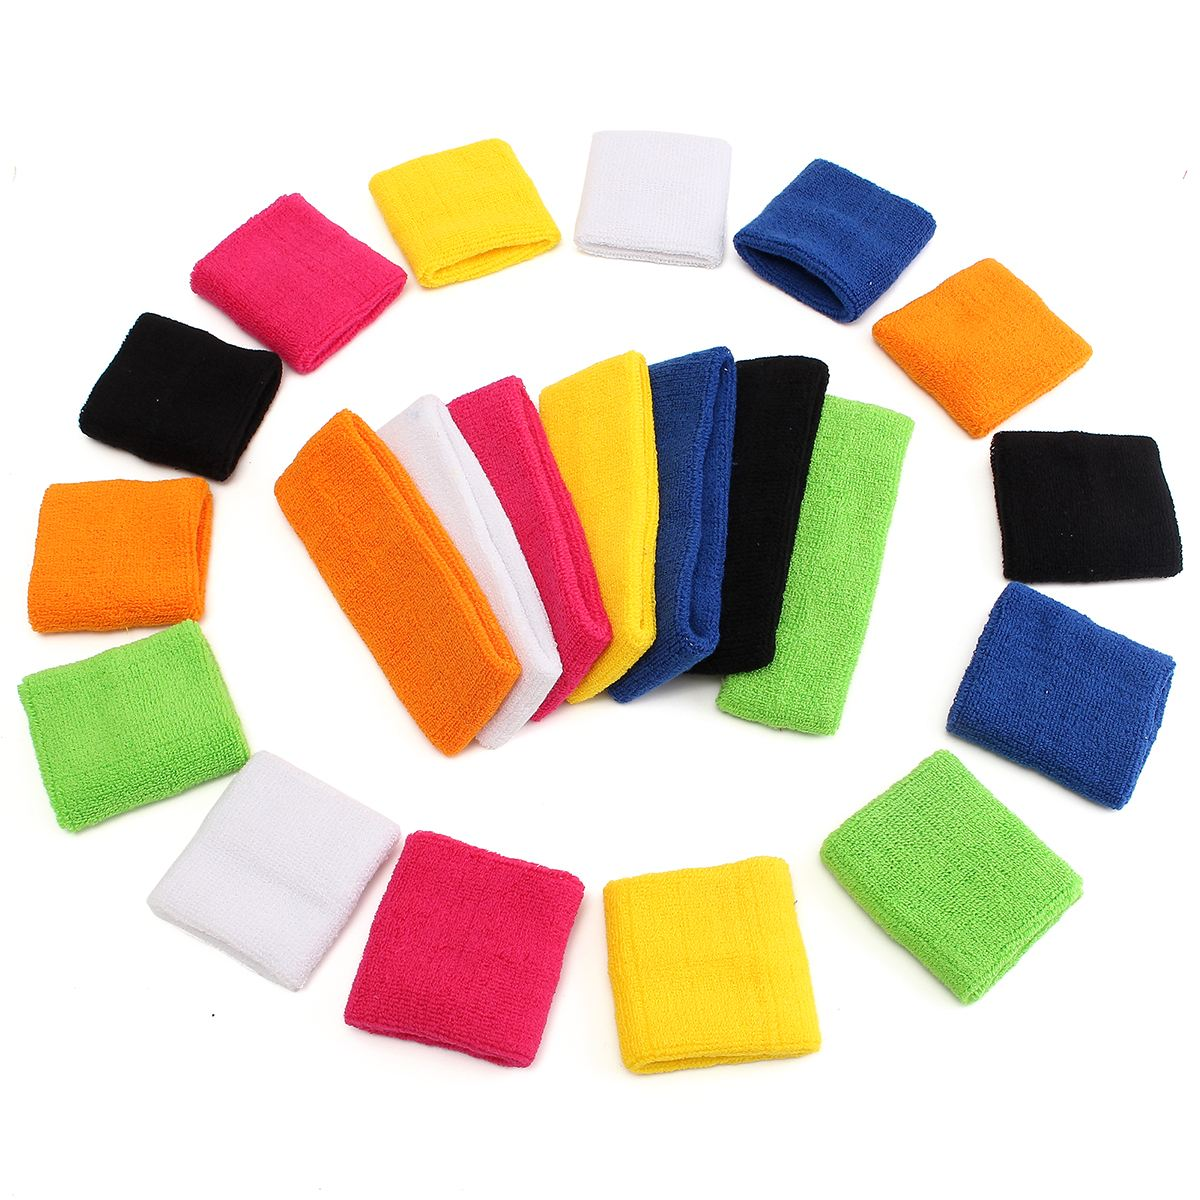 New 3pcs/set Wristband+Headband Tennis/Basketball/Badminton Wrist Support Sports Protector Sweatband Cotton Gym Wrist Guard